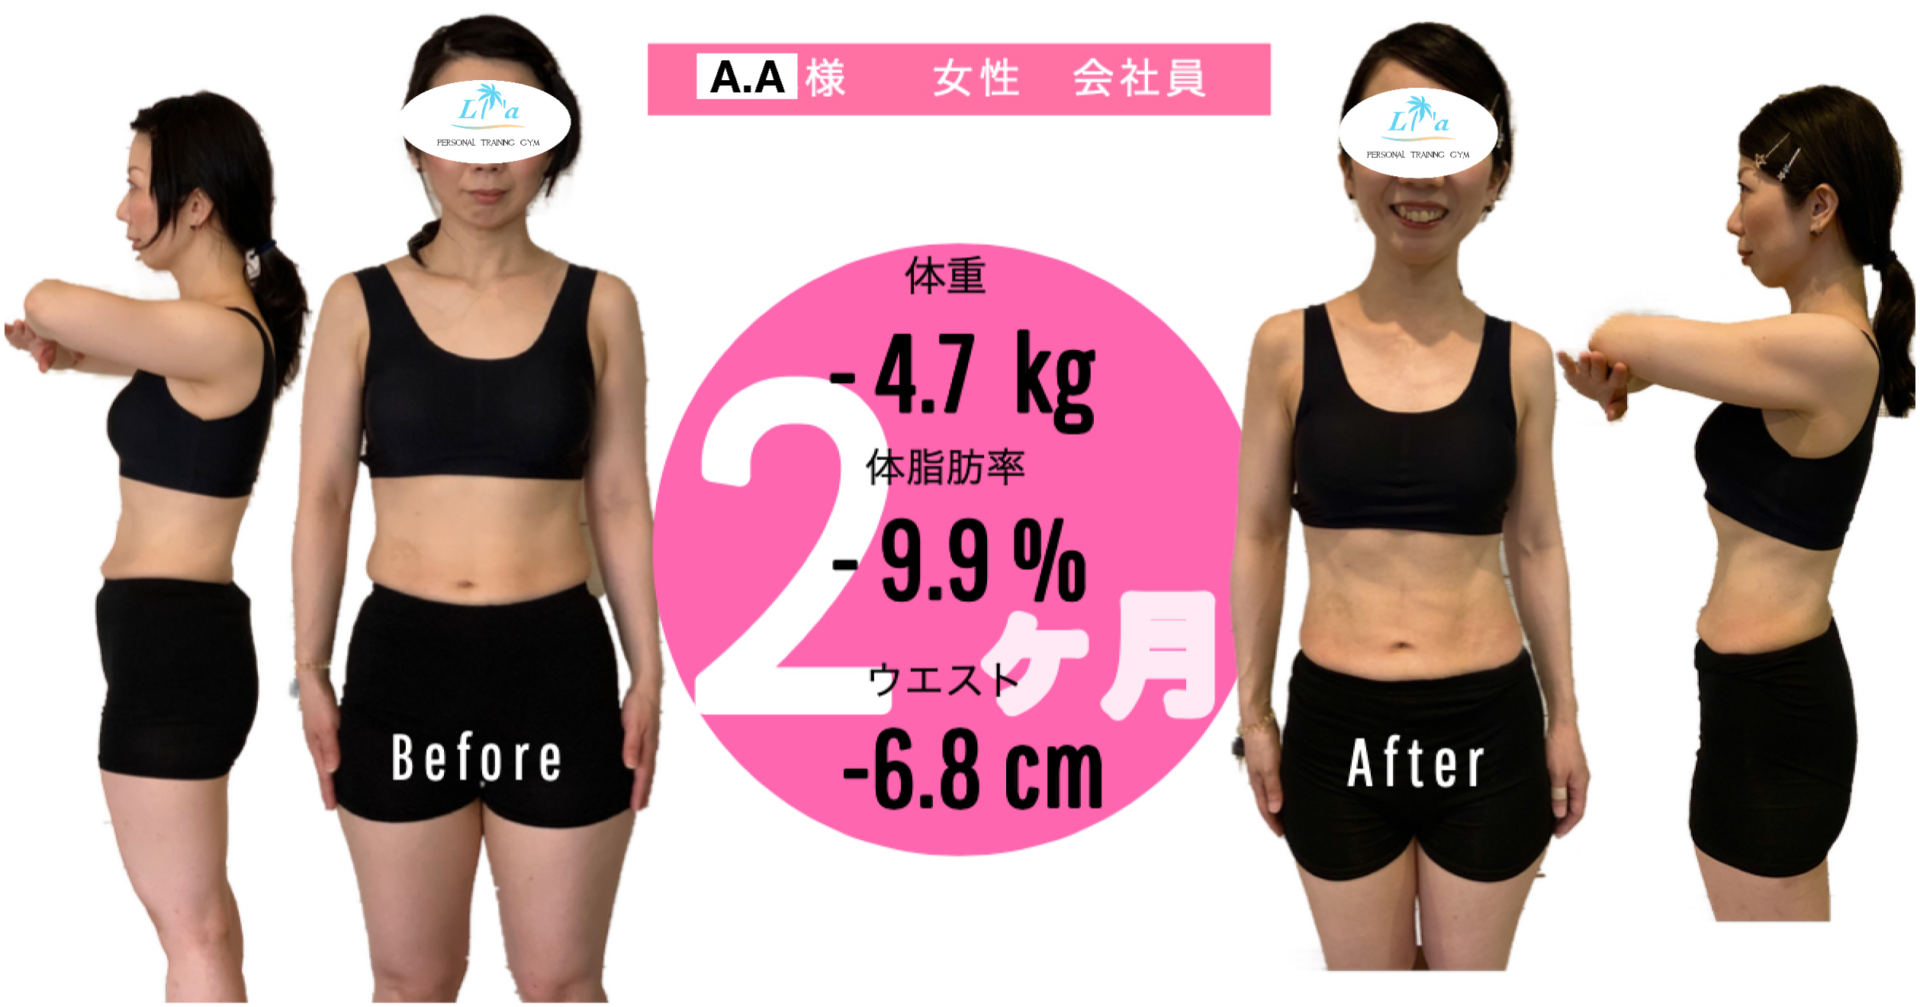 A,A様女性会社員、体重-4.7kg 体脂肪率-9.9% ウエスト-6.8cm ビフォーアフター写真